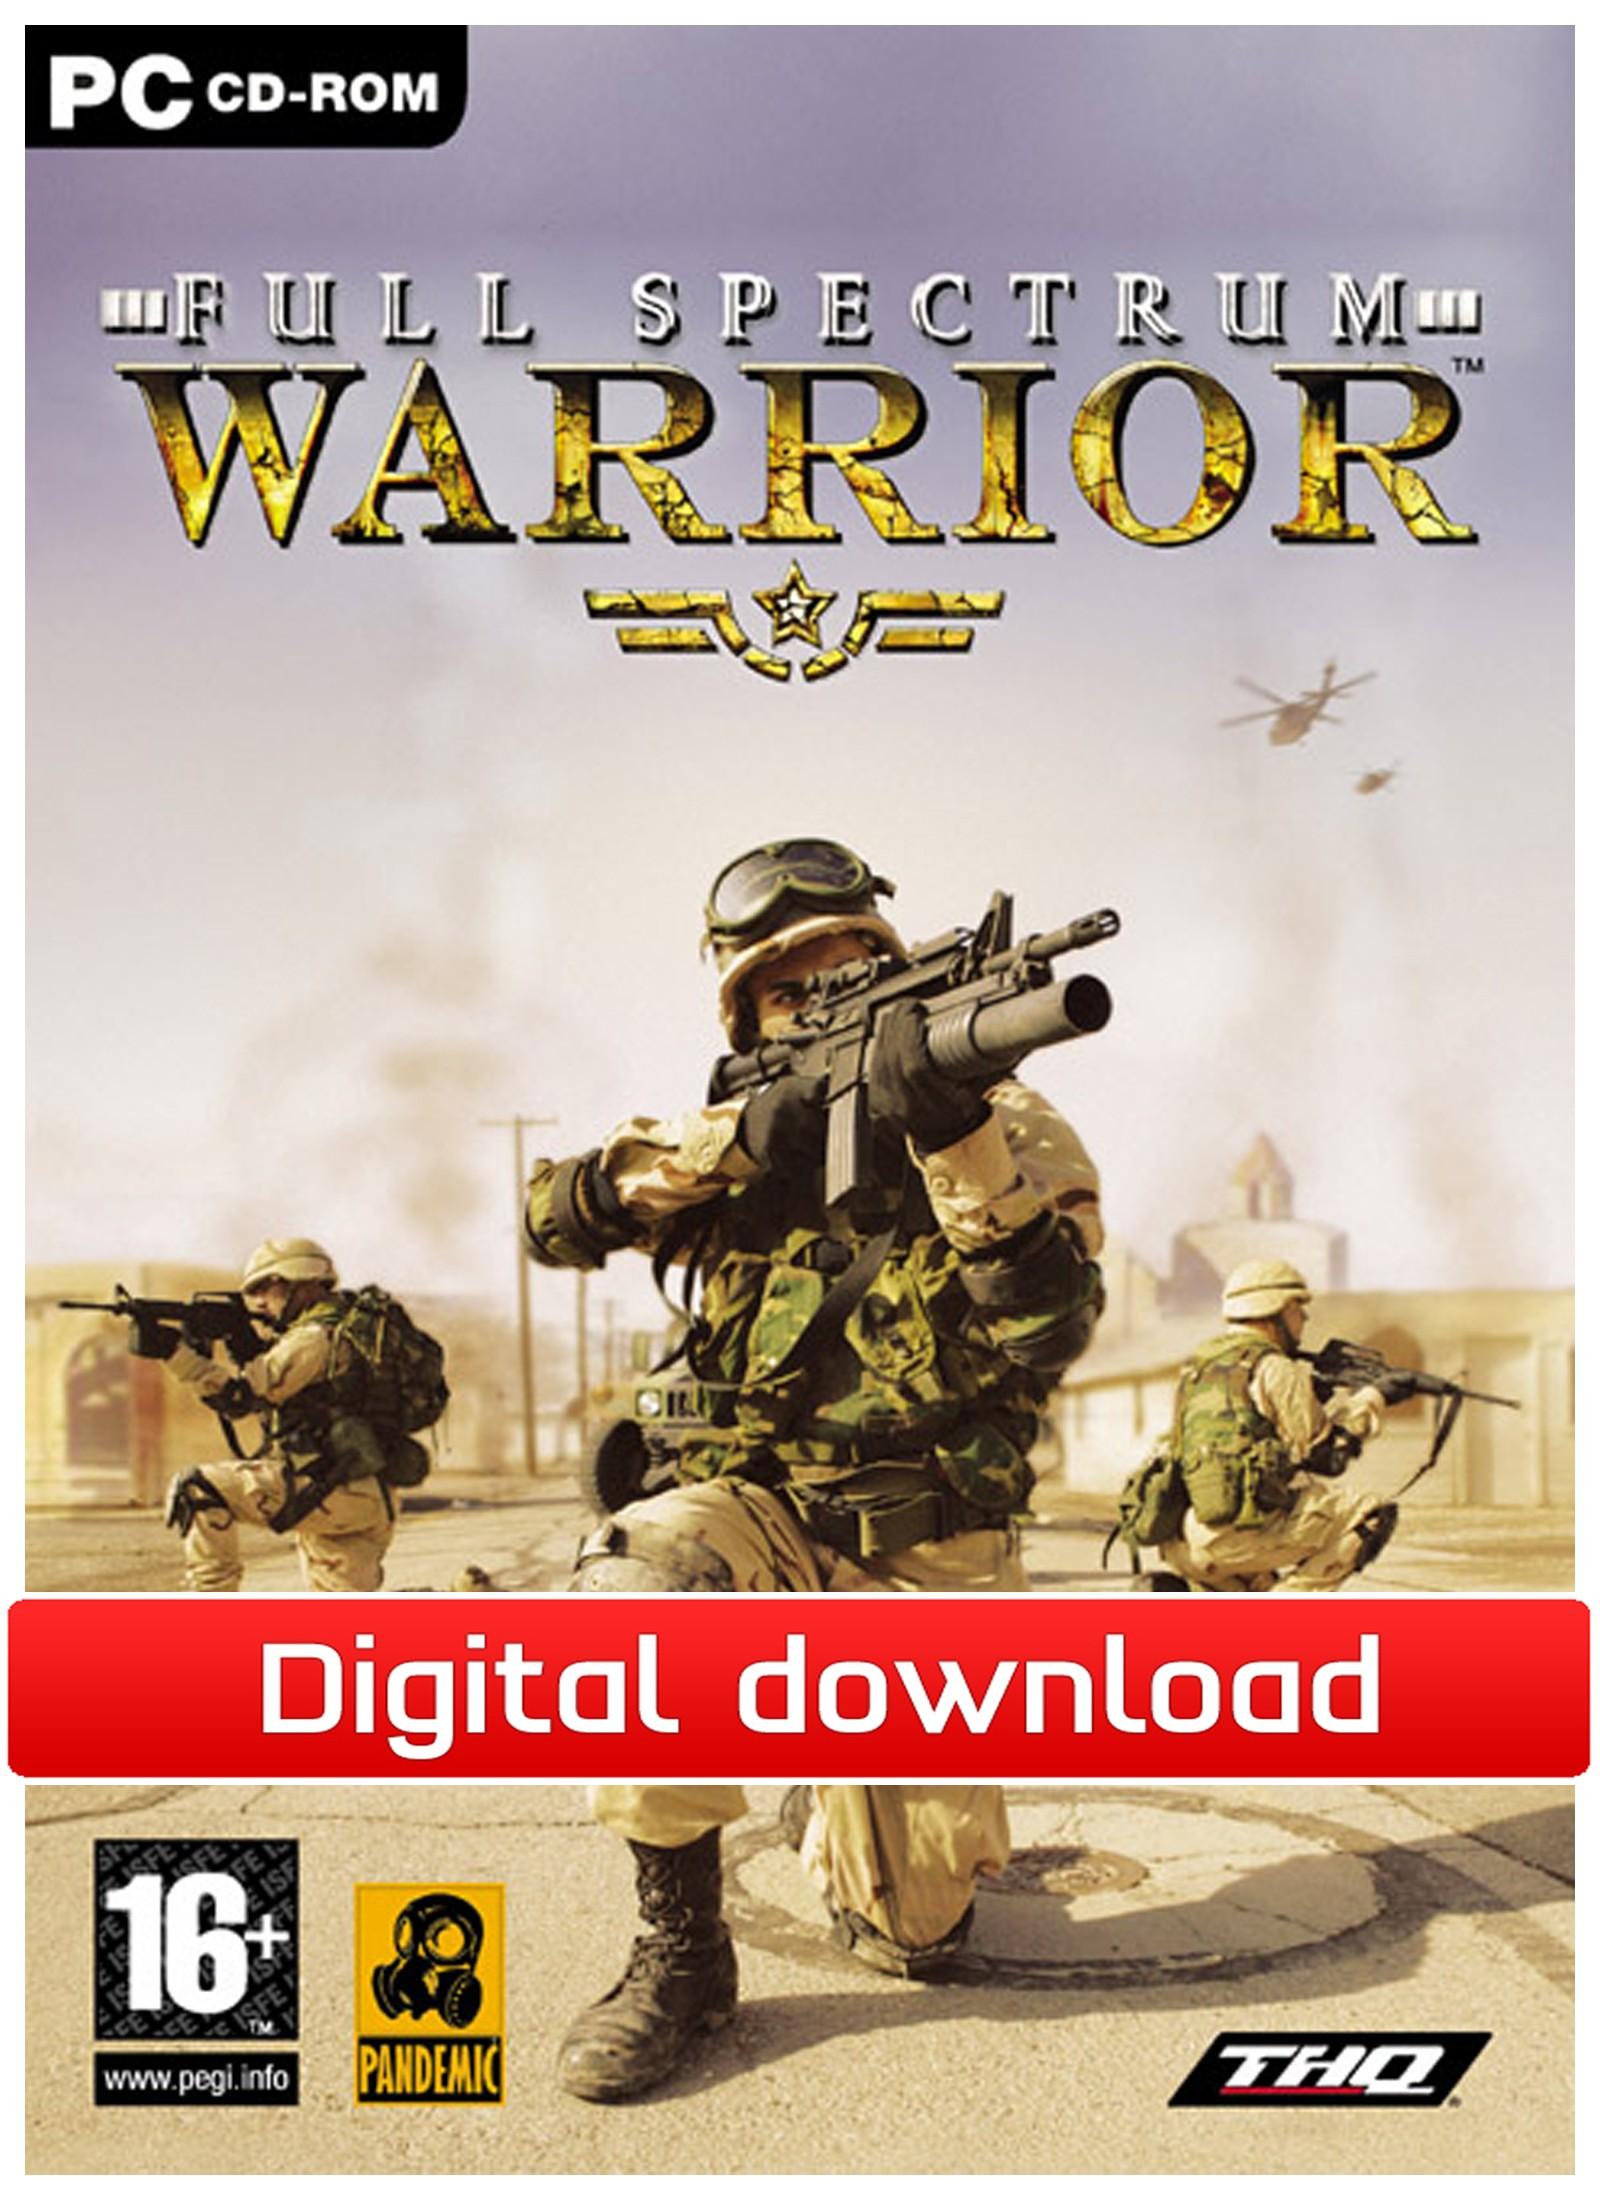 Full Spectrum Warrior (PC nedlastning) PCDD33873